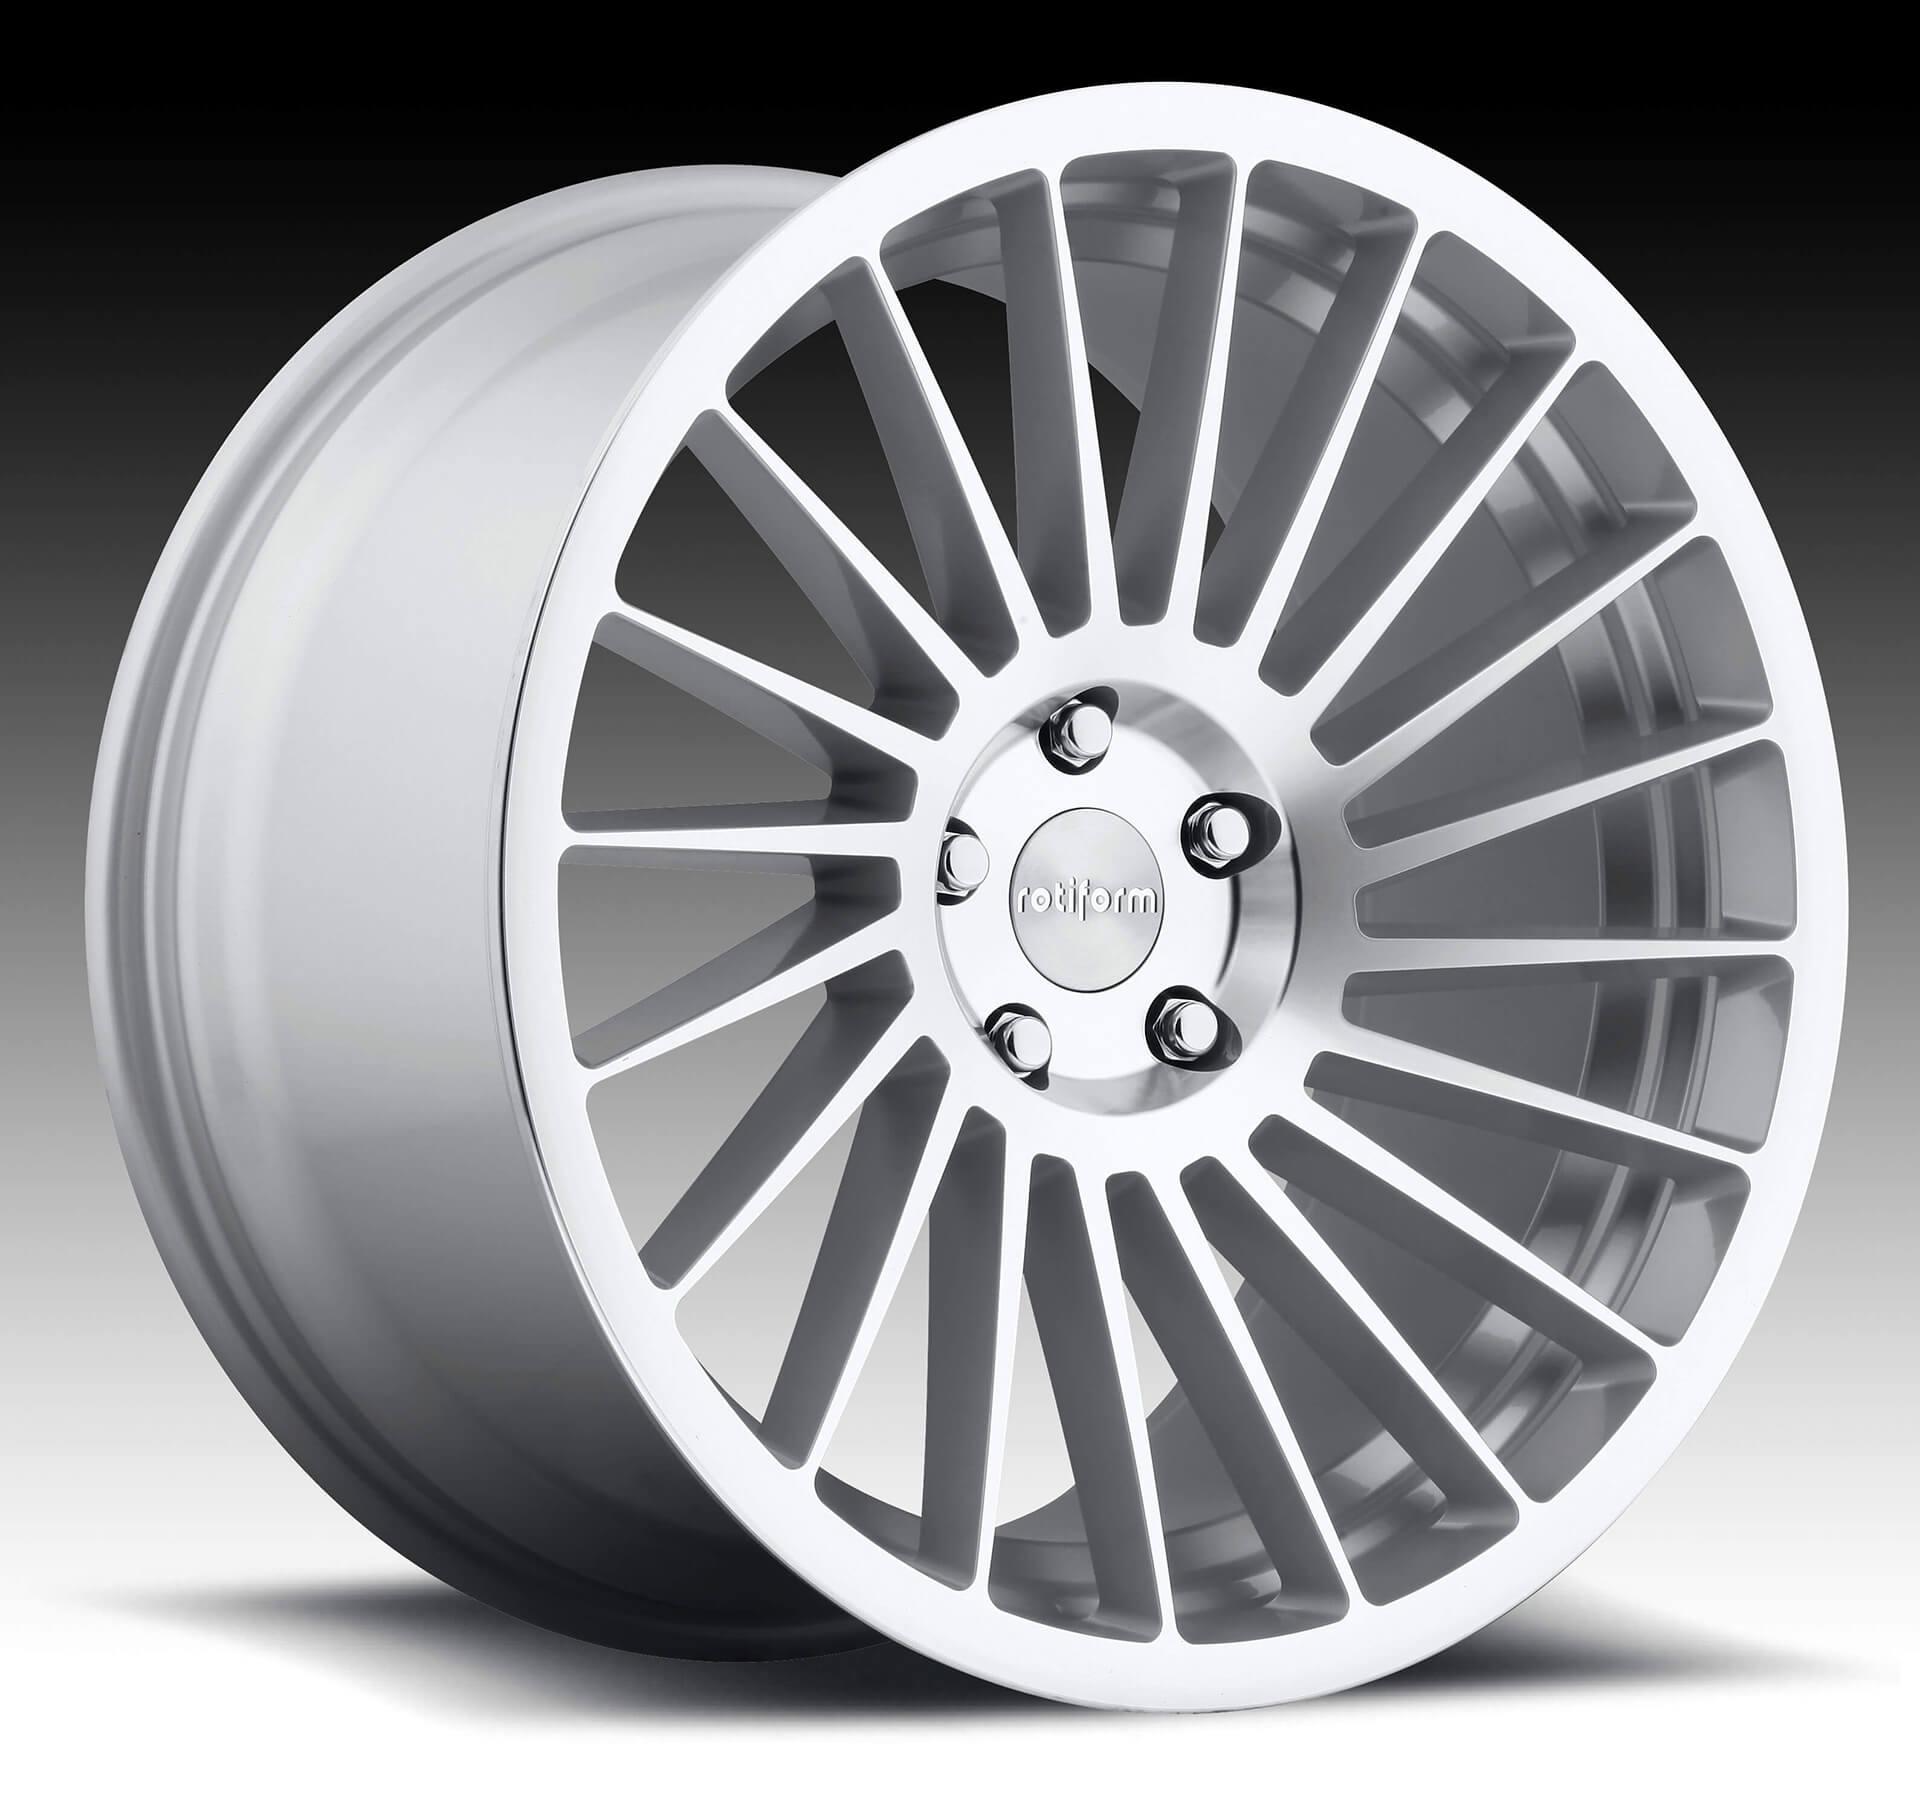 Rotiform Monoblock Wheel - IND-T Cast 1 Piece